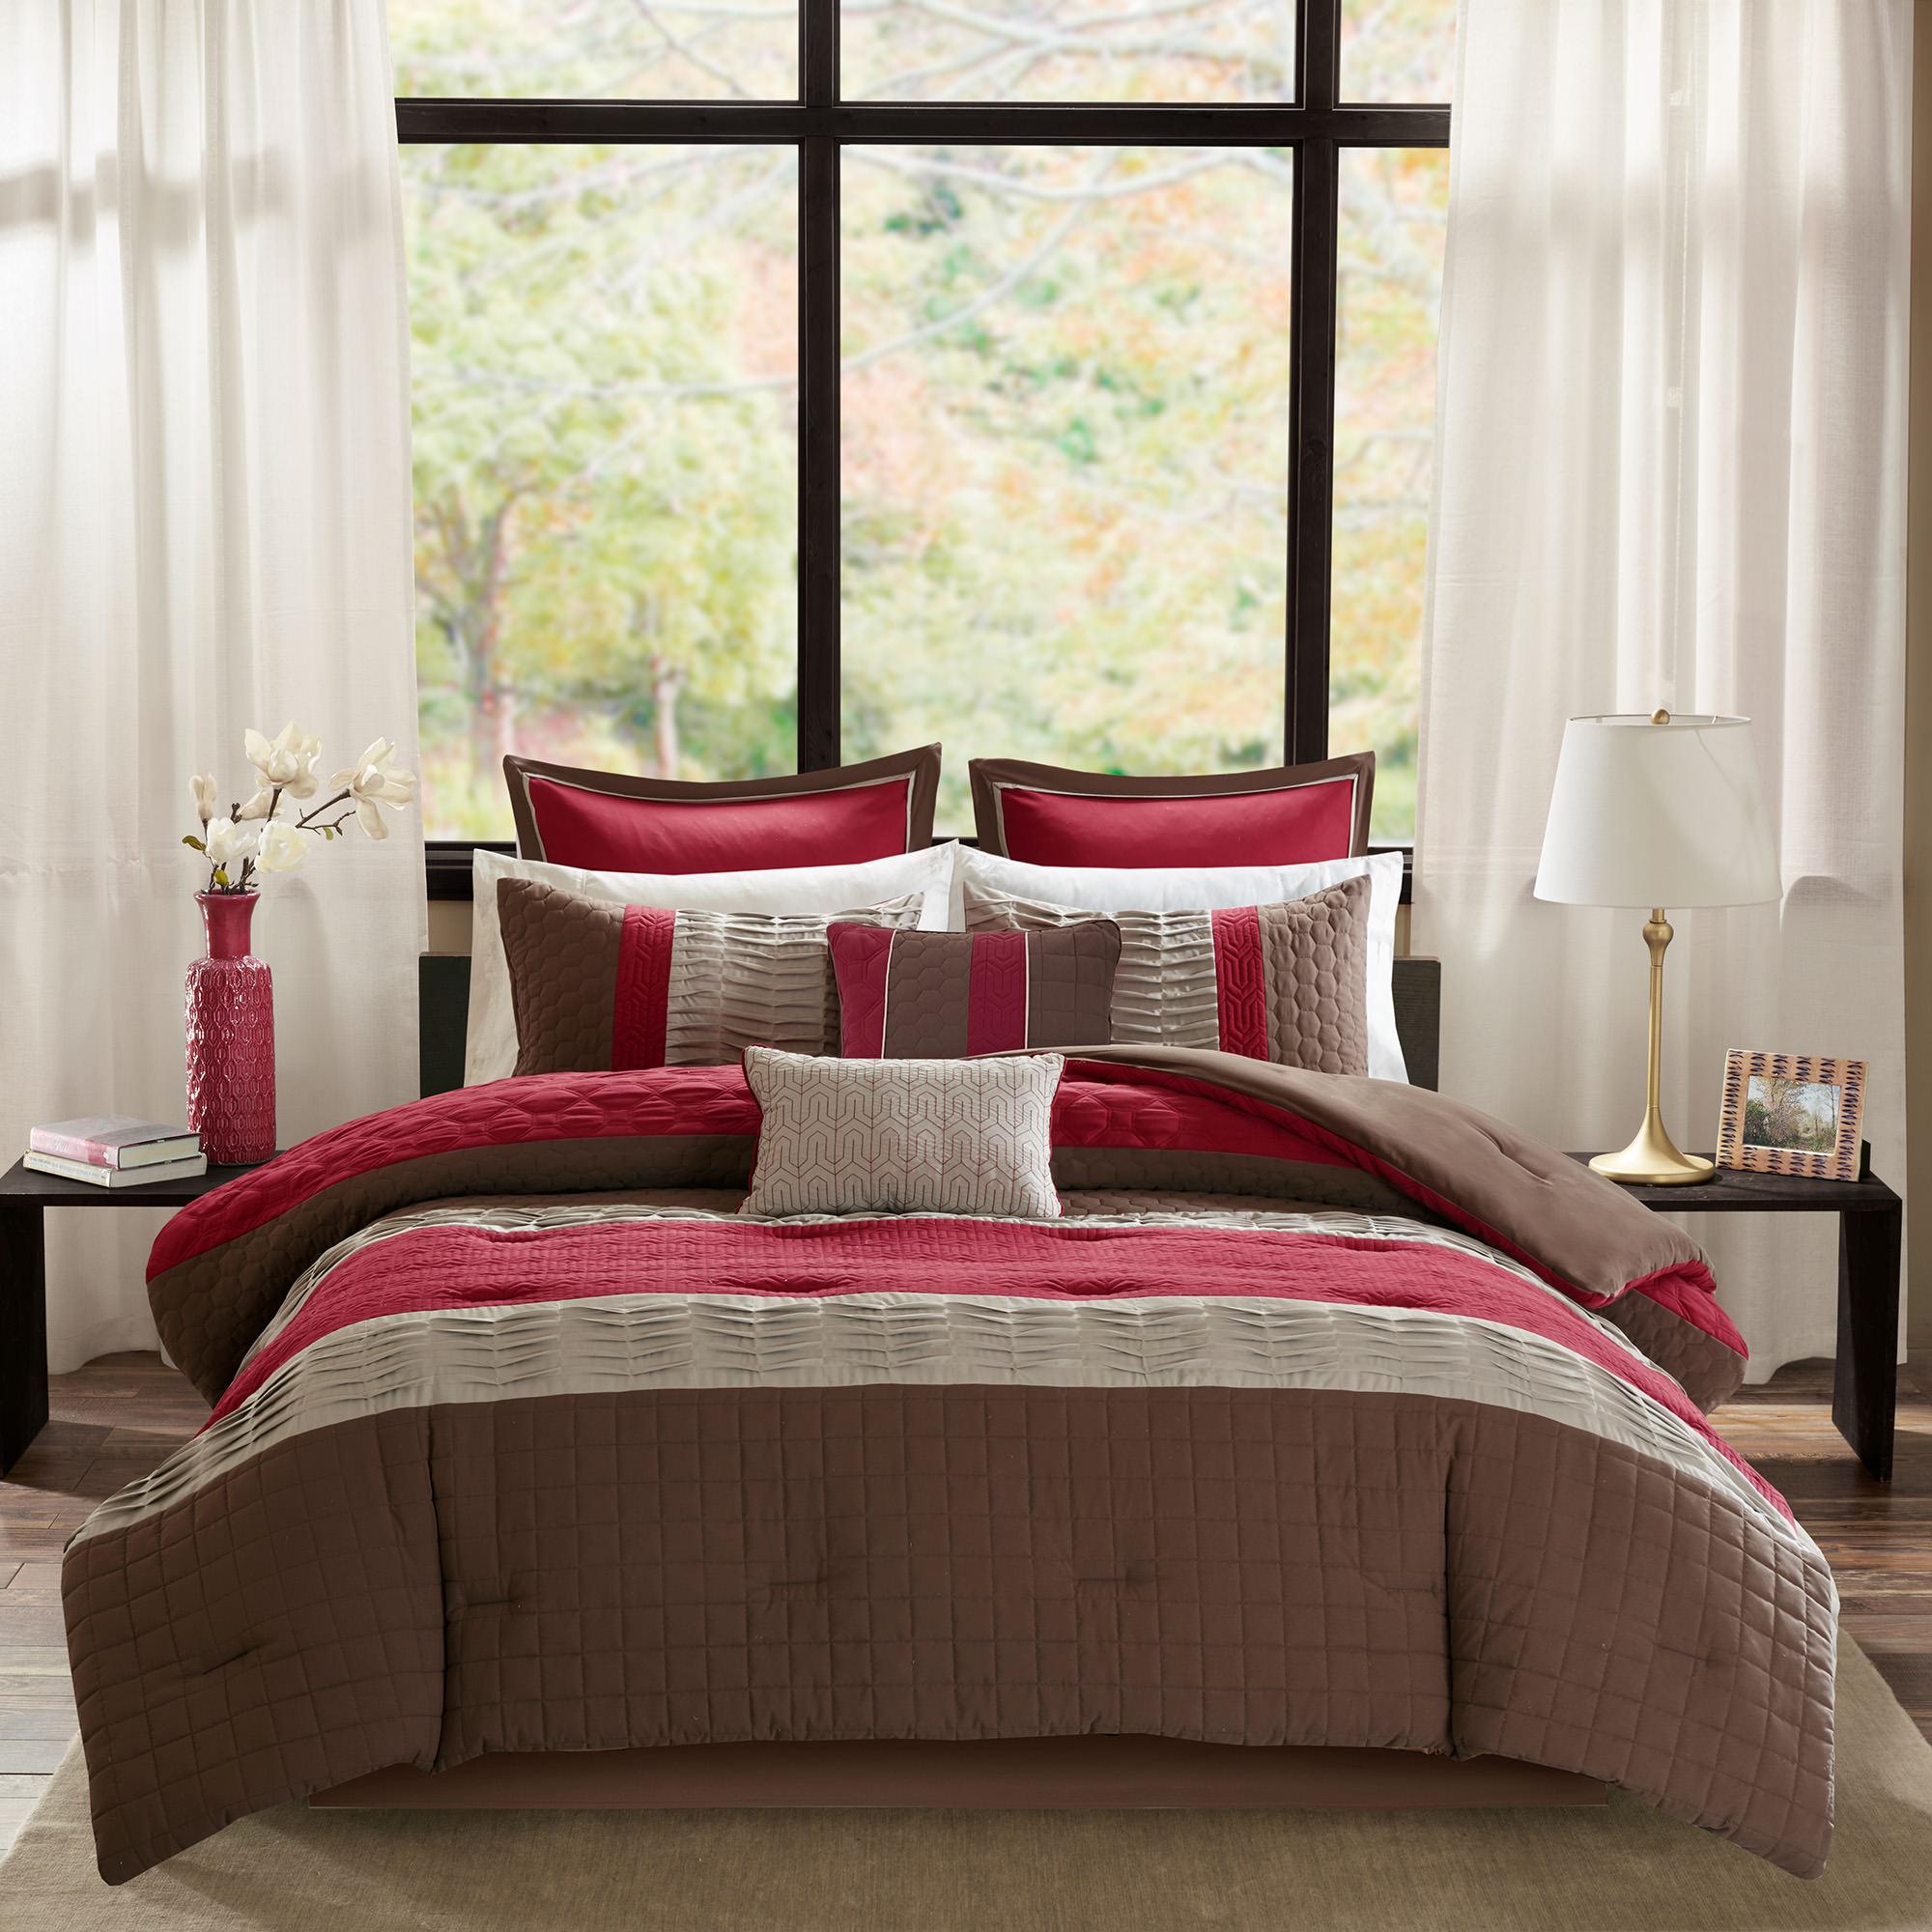 Home Essence Hayden 8 Piece Quilted Comforter Bedding Set